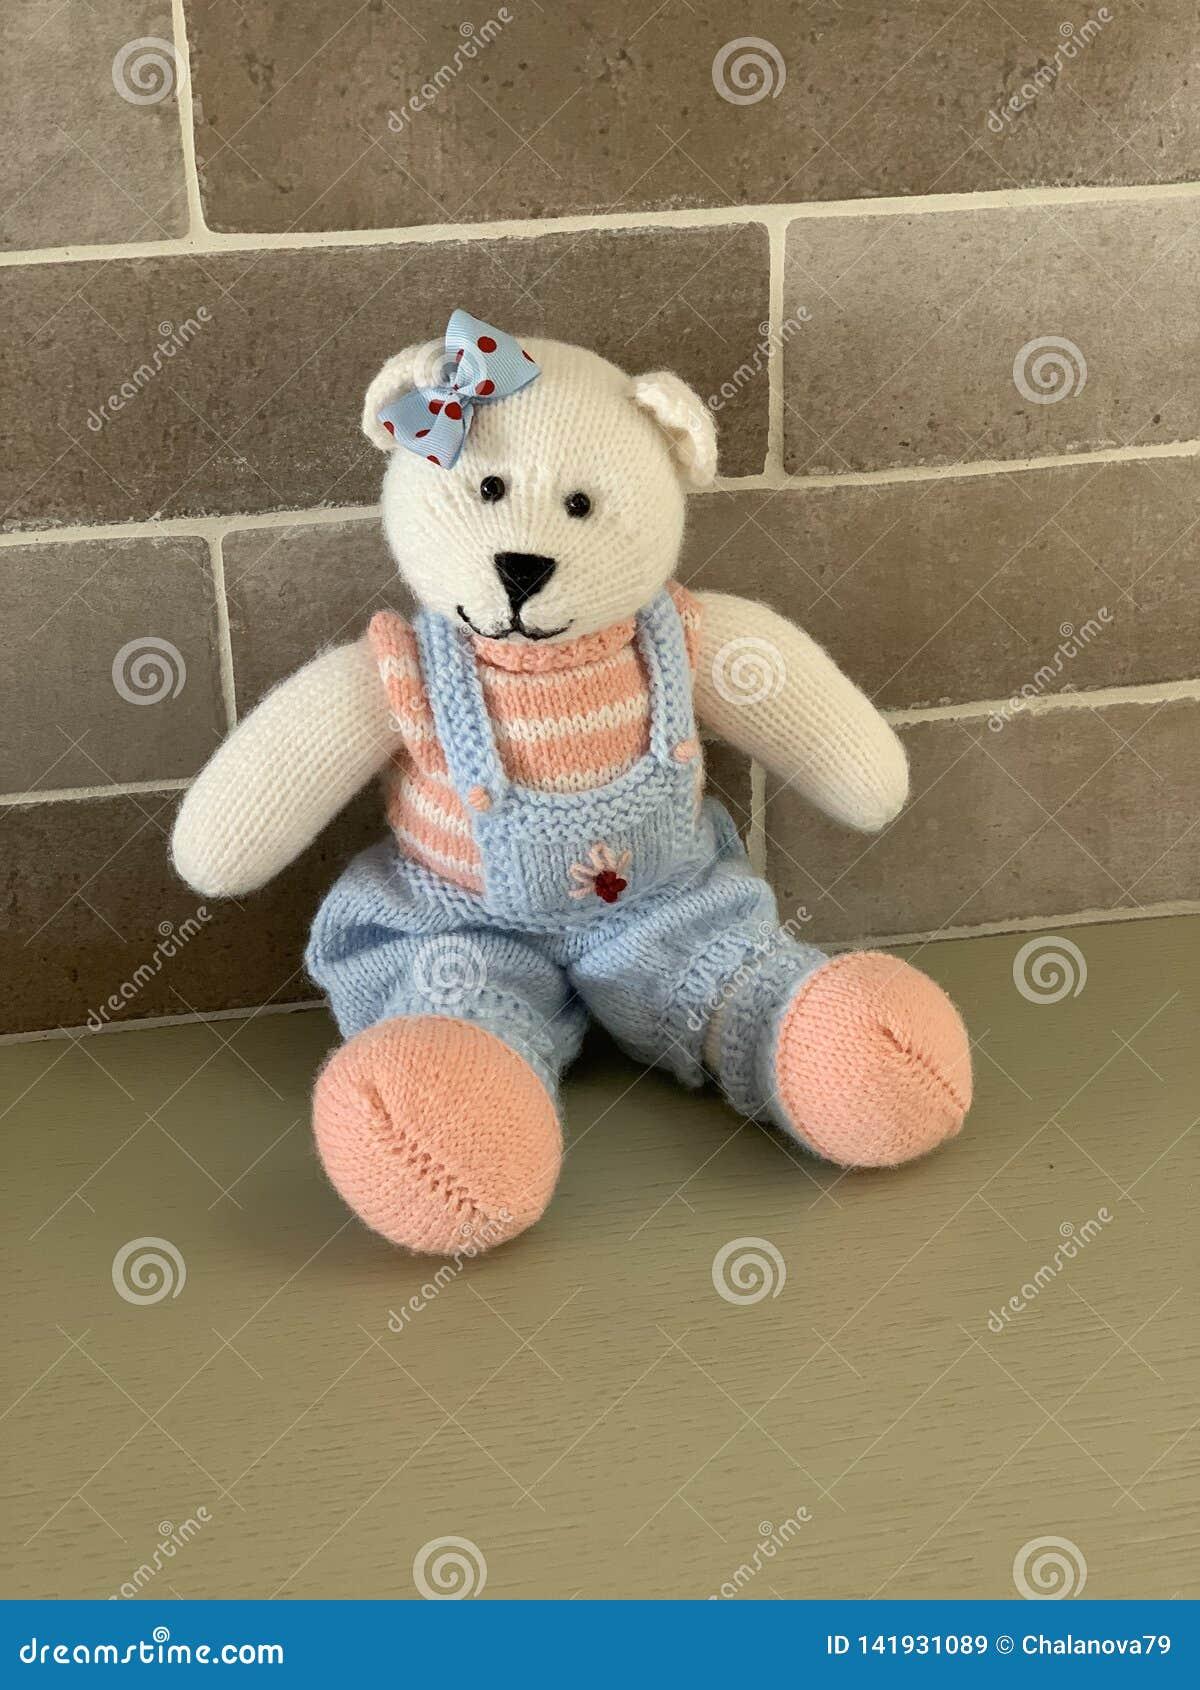 Crochet Teddy Bear Girl - Gift for Girl - Cute Stuffed Animals ... | 1689x1200